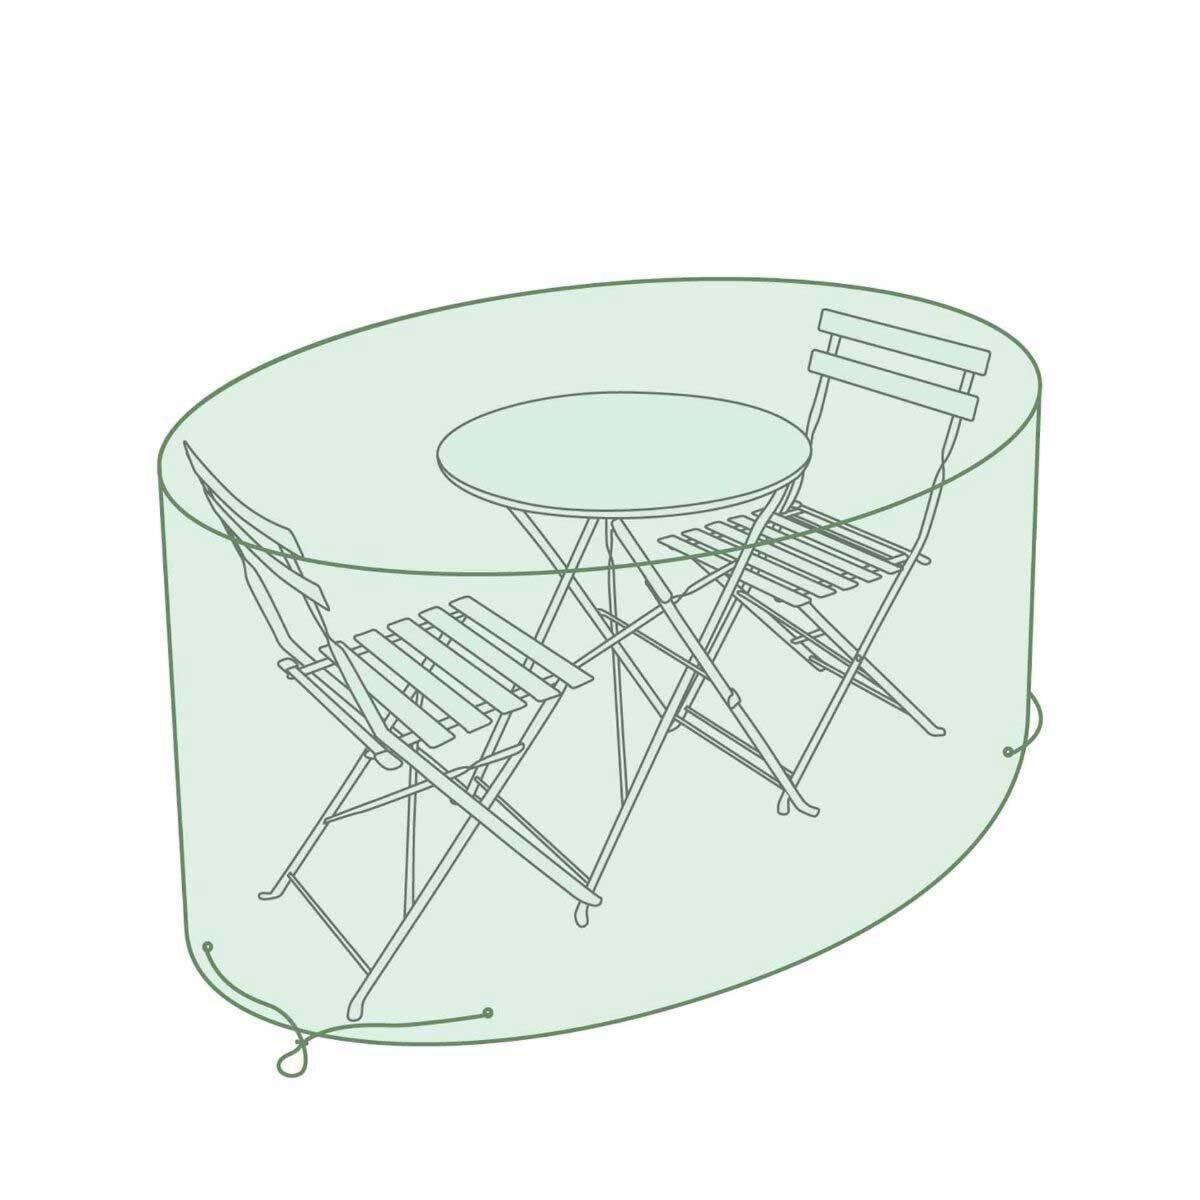 Charles Bentley Small Round Bistro Set Tarpaulin Garden Furniture Cover